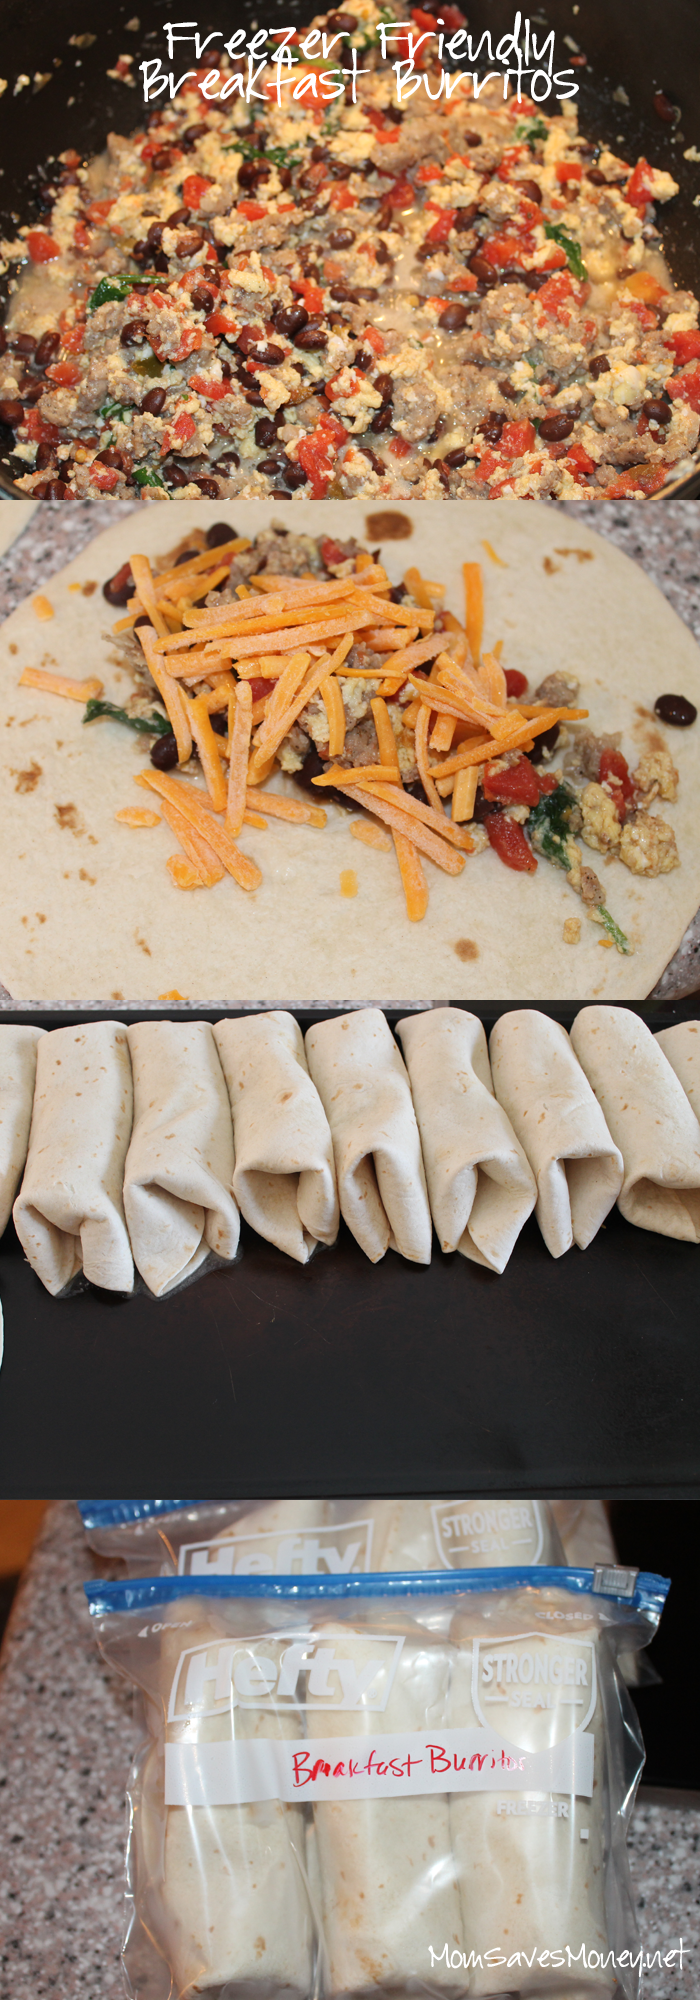 Freezer Ready Breakfast Burritos